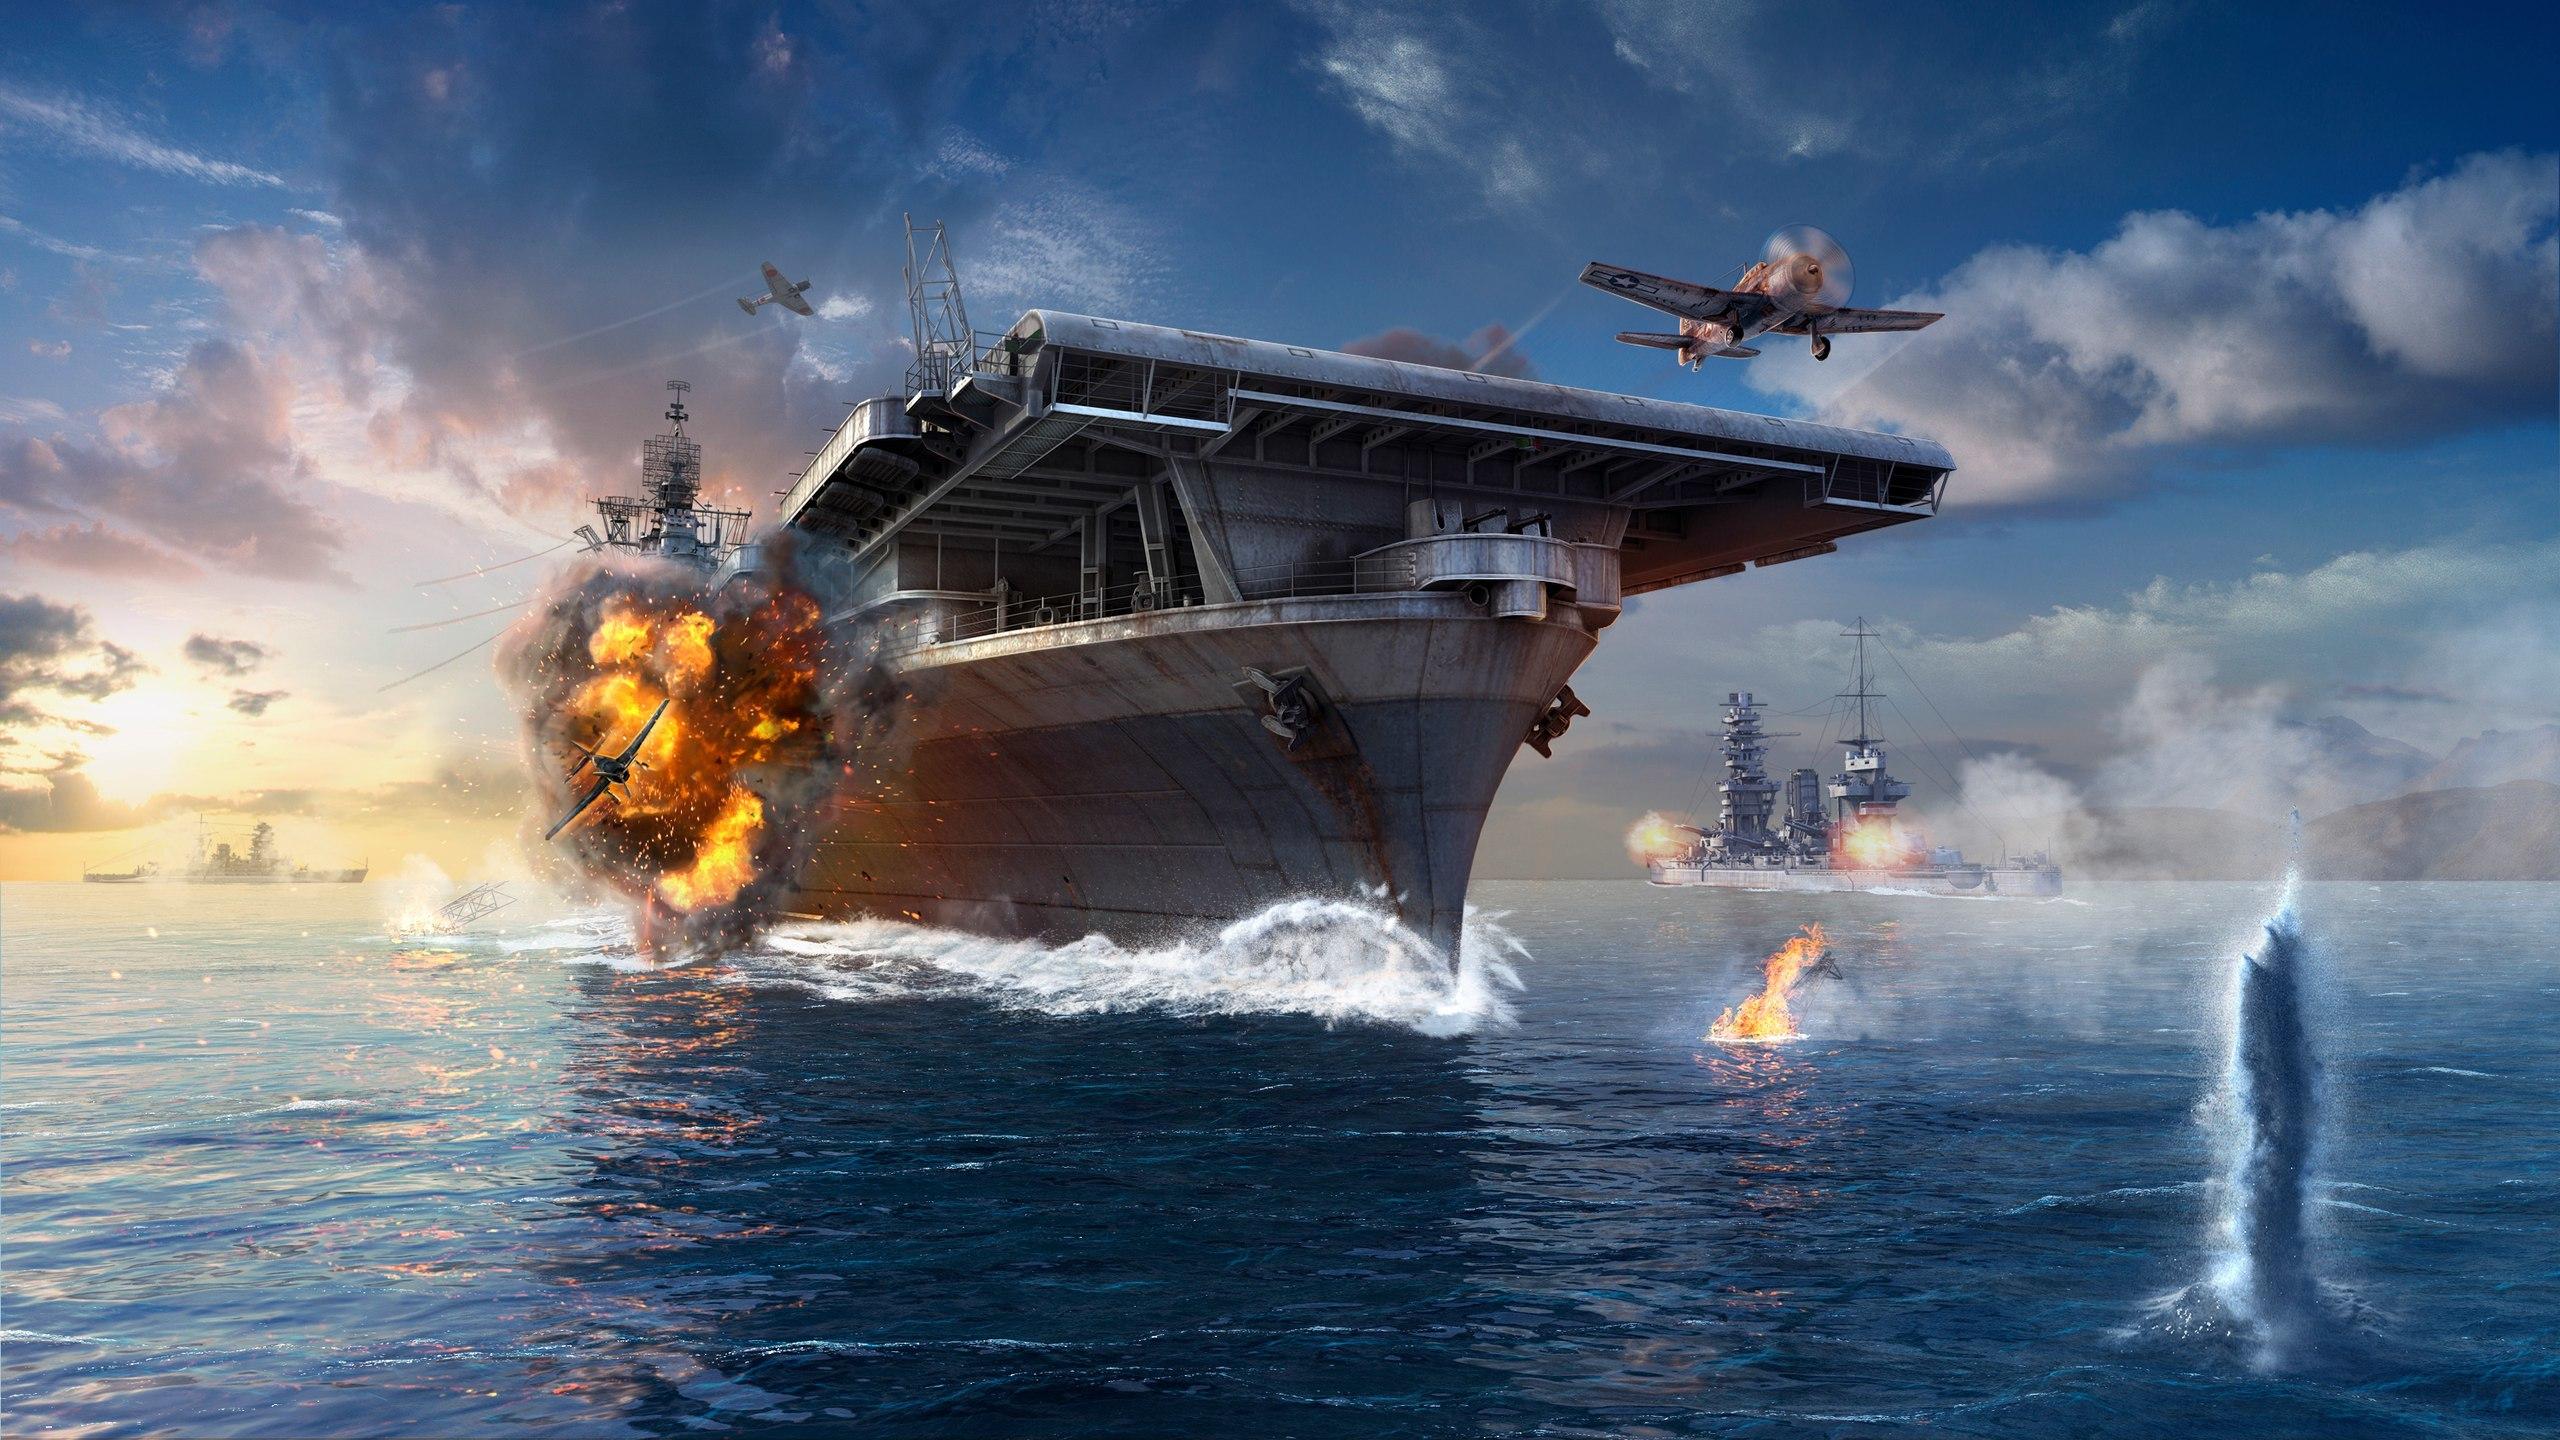 world of warships wallpaper 2560x1080